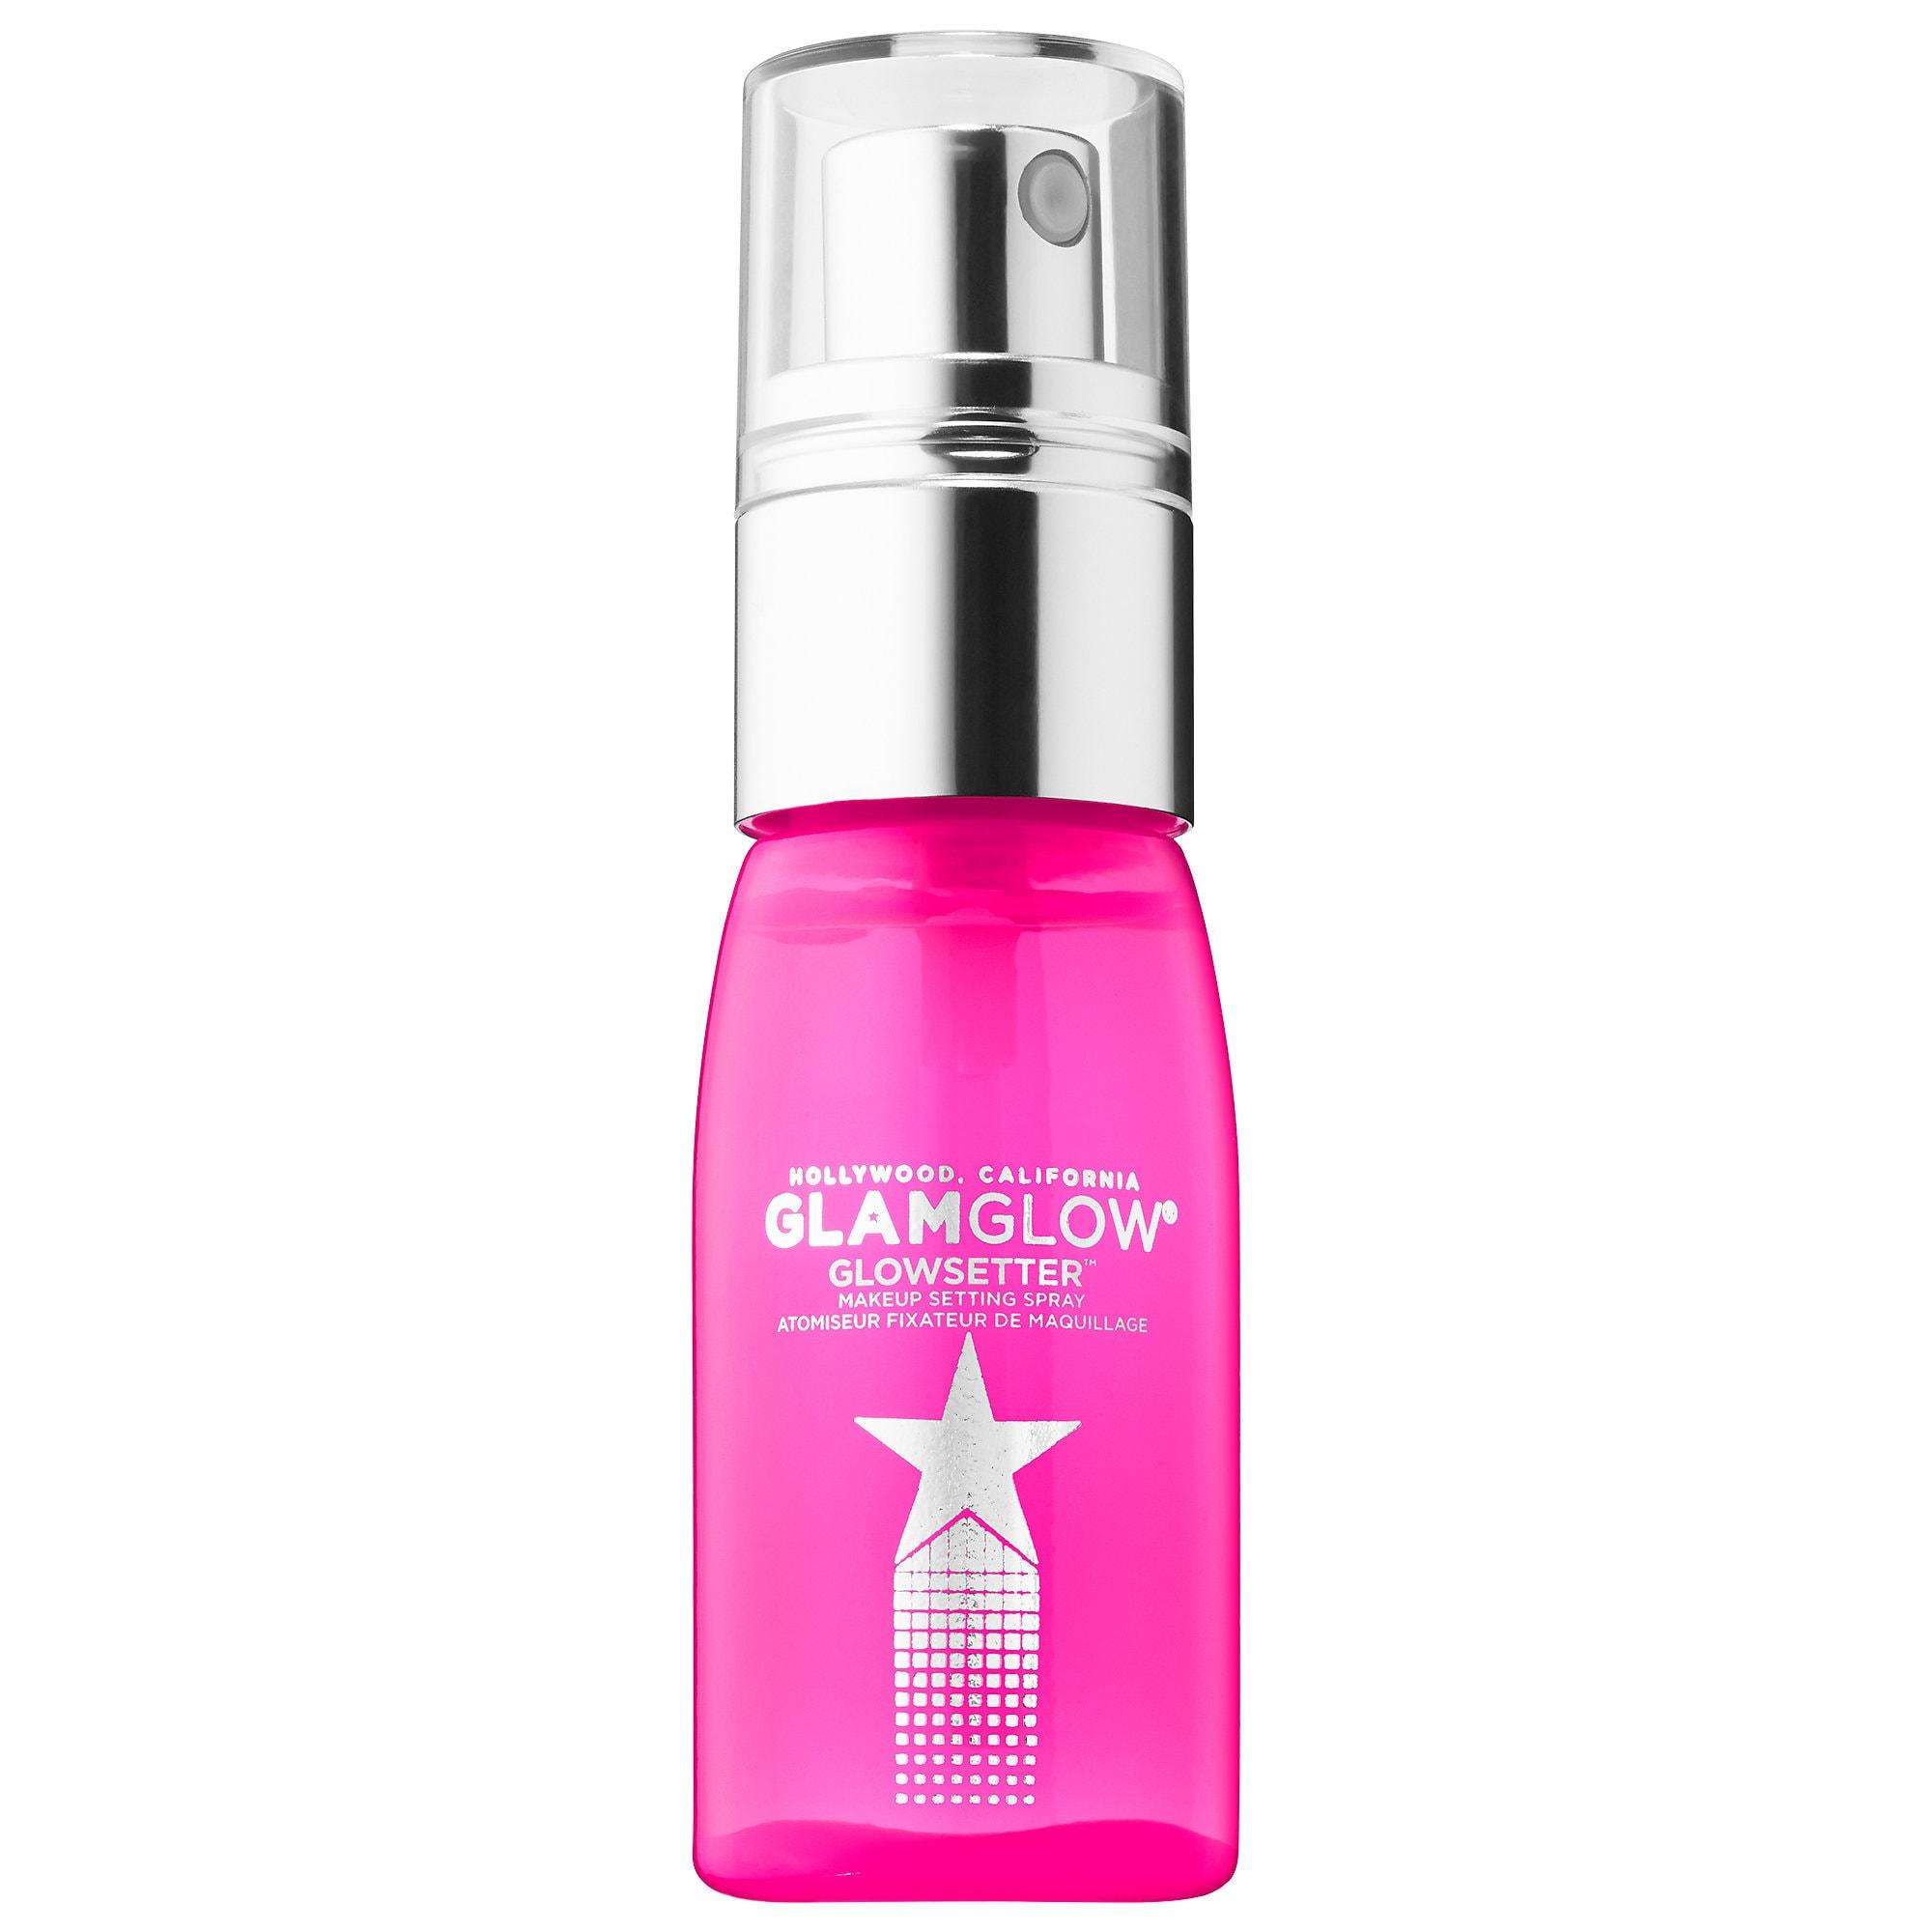 Glamglow - GLOWSETTER™ Makeup Setting Spray